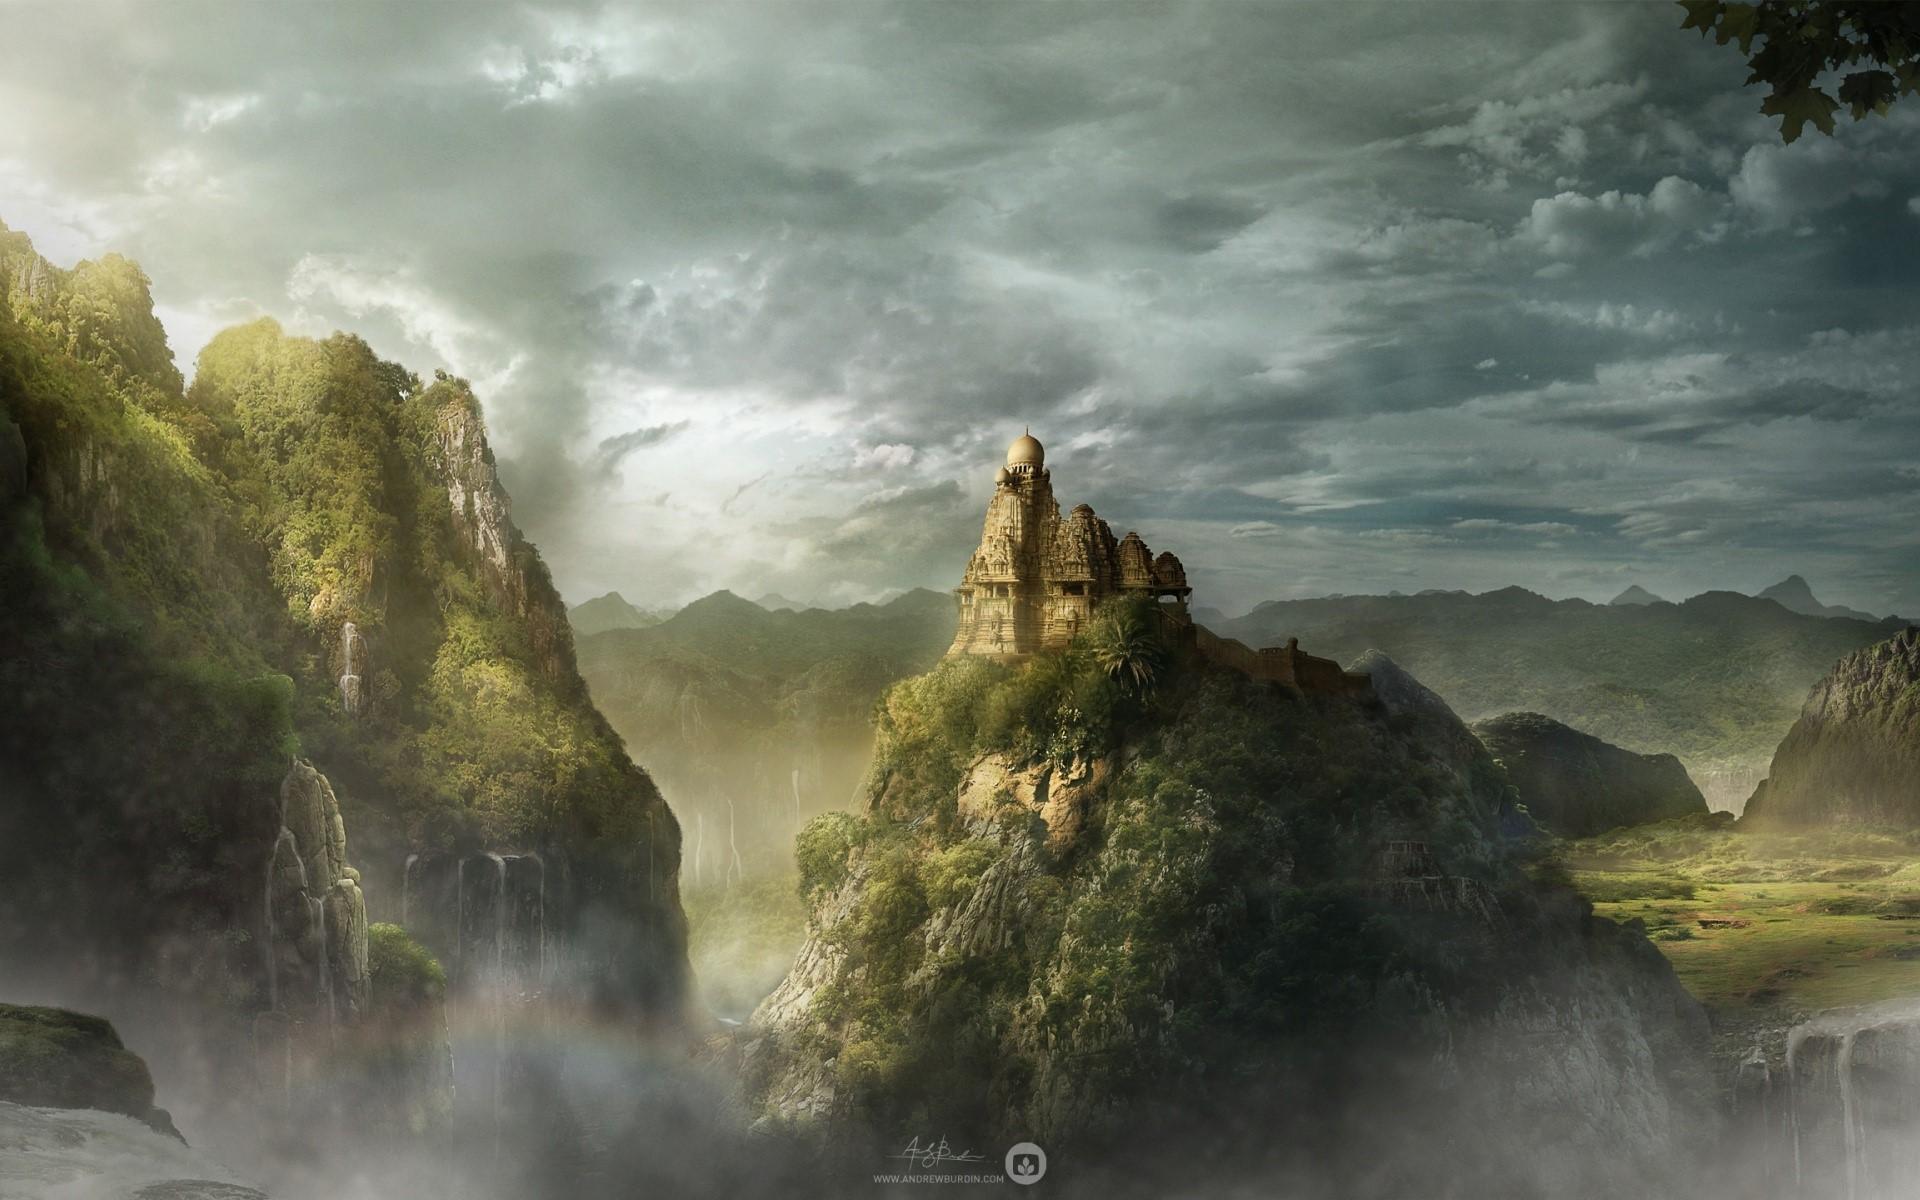 Wallpaper Kingdom of the mountain